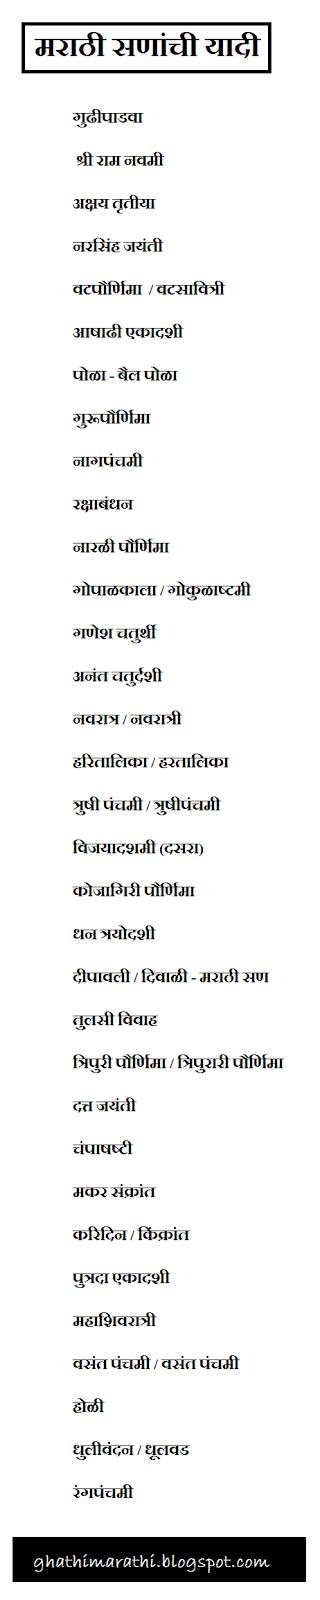 marathi festival san list1